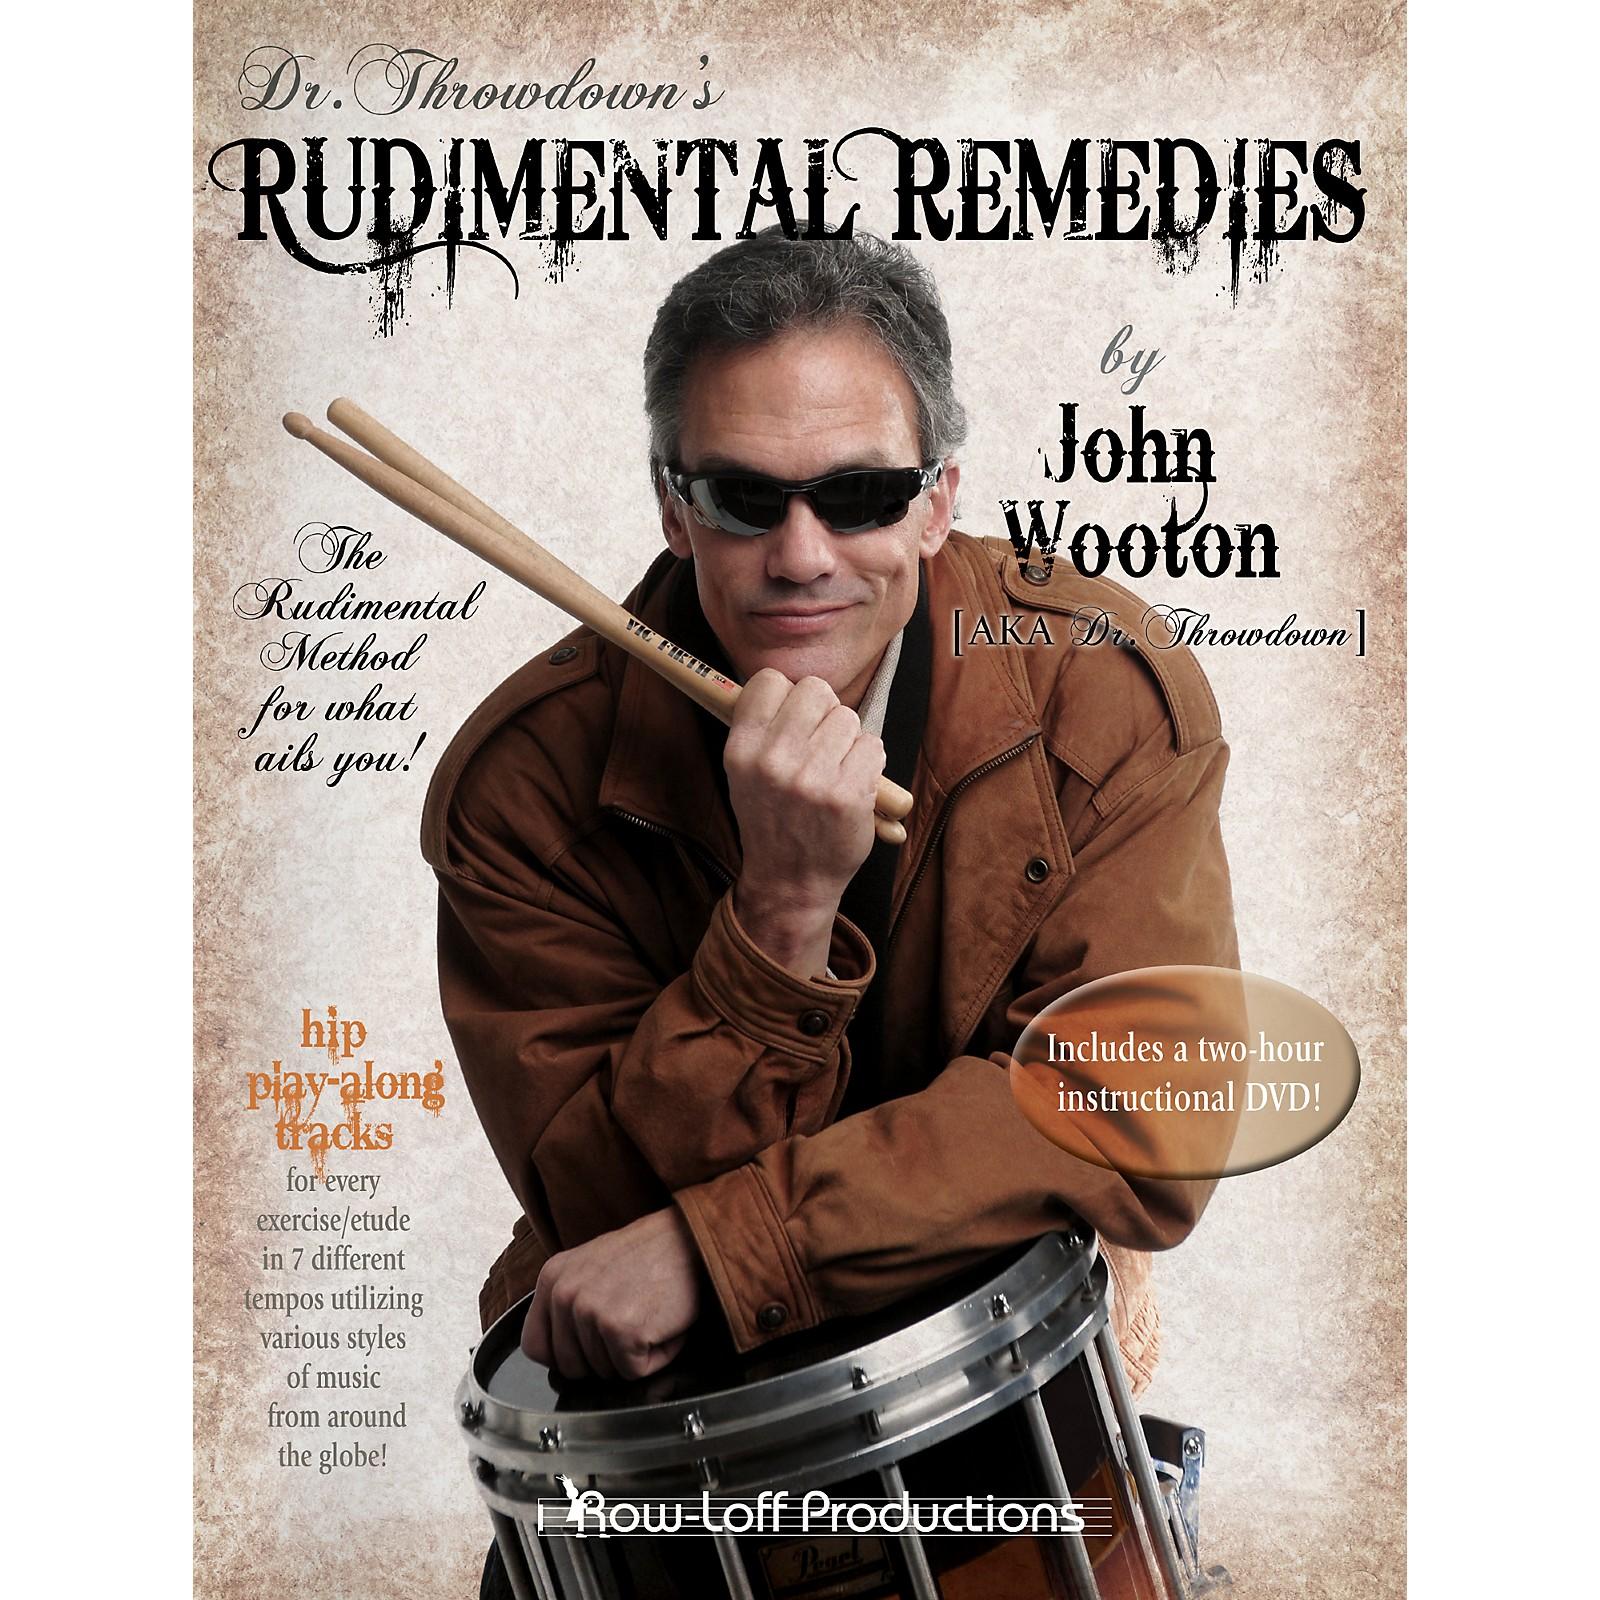 Row-Loff Rudimental Remedies Book